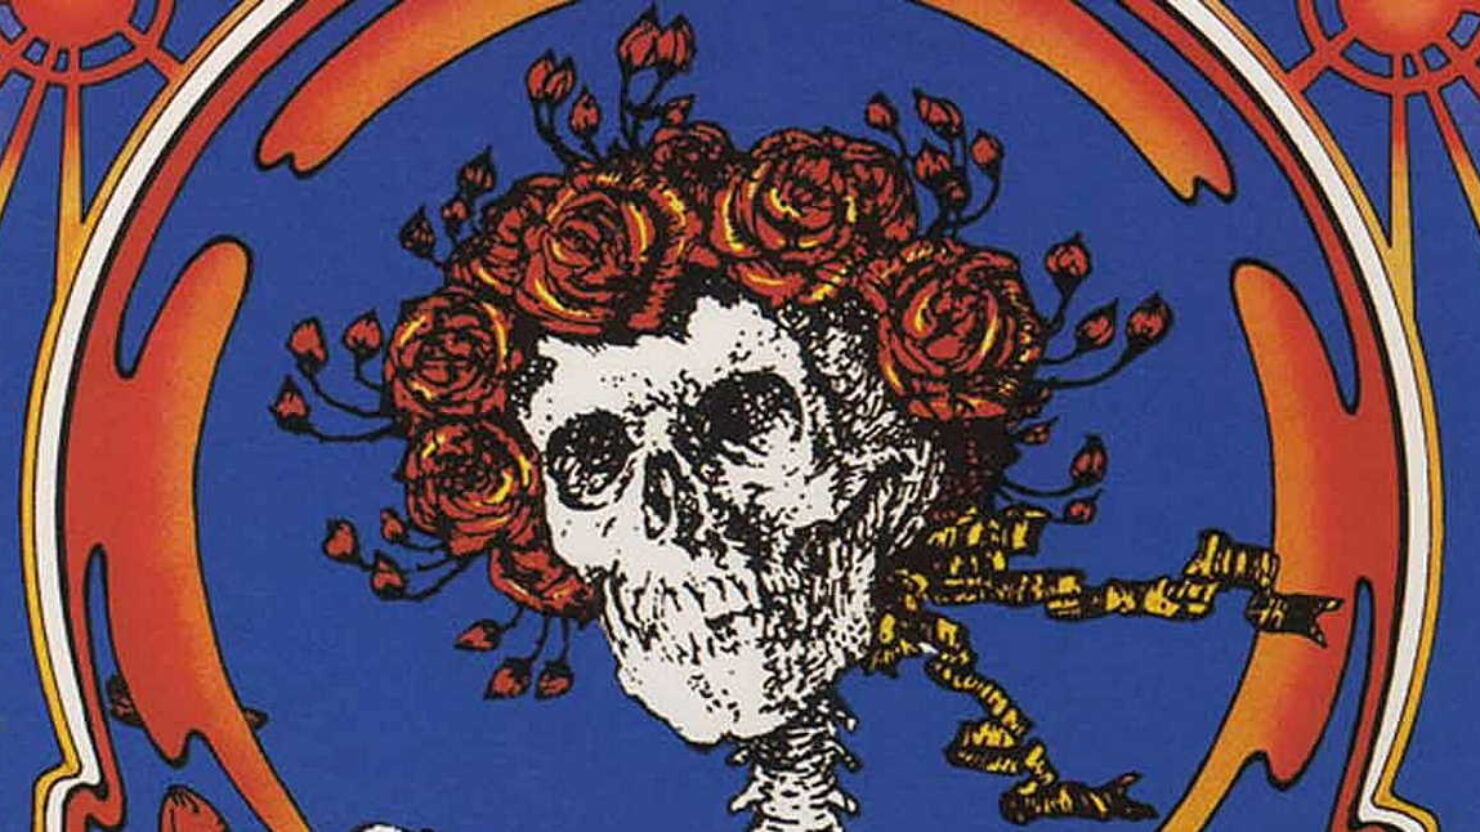 Grateful Dead Confirms 'Skull & Roses' 50th Anniversary Reissue